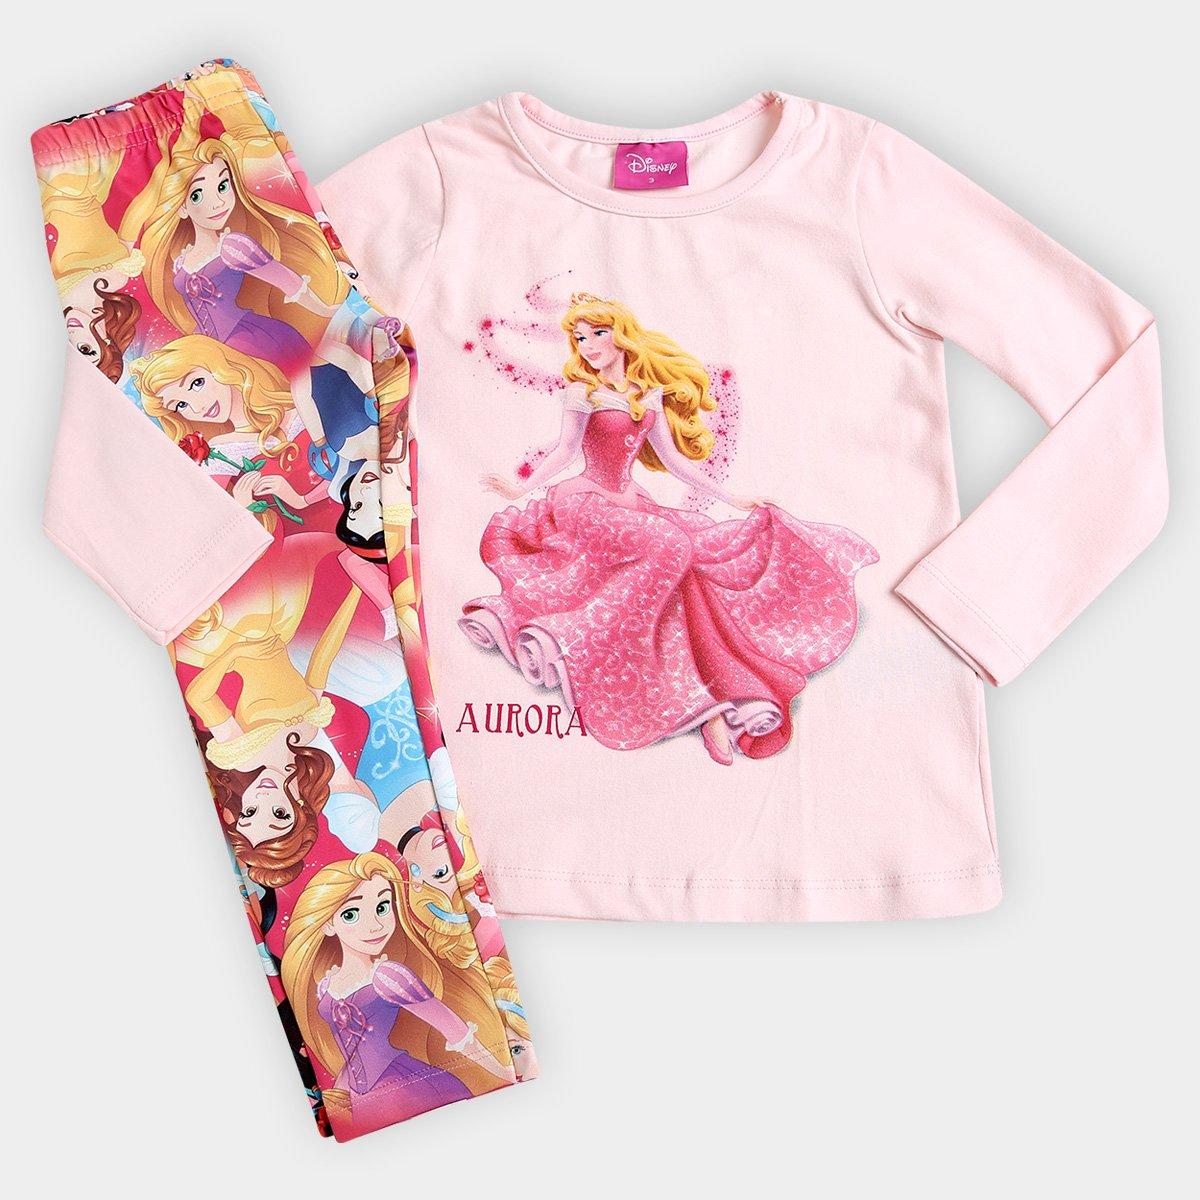 366c44fc2 Conjunto Brandili Disney Princesas Infantil - Compre Agora